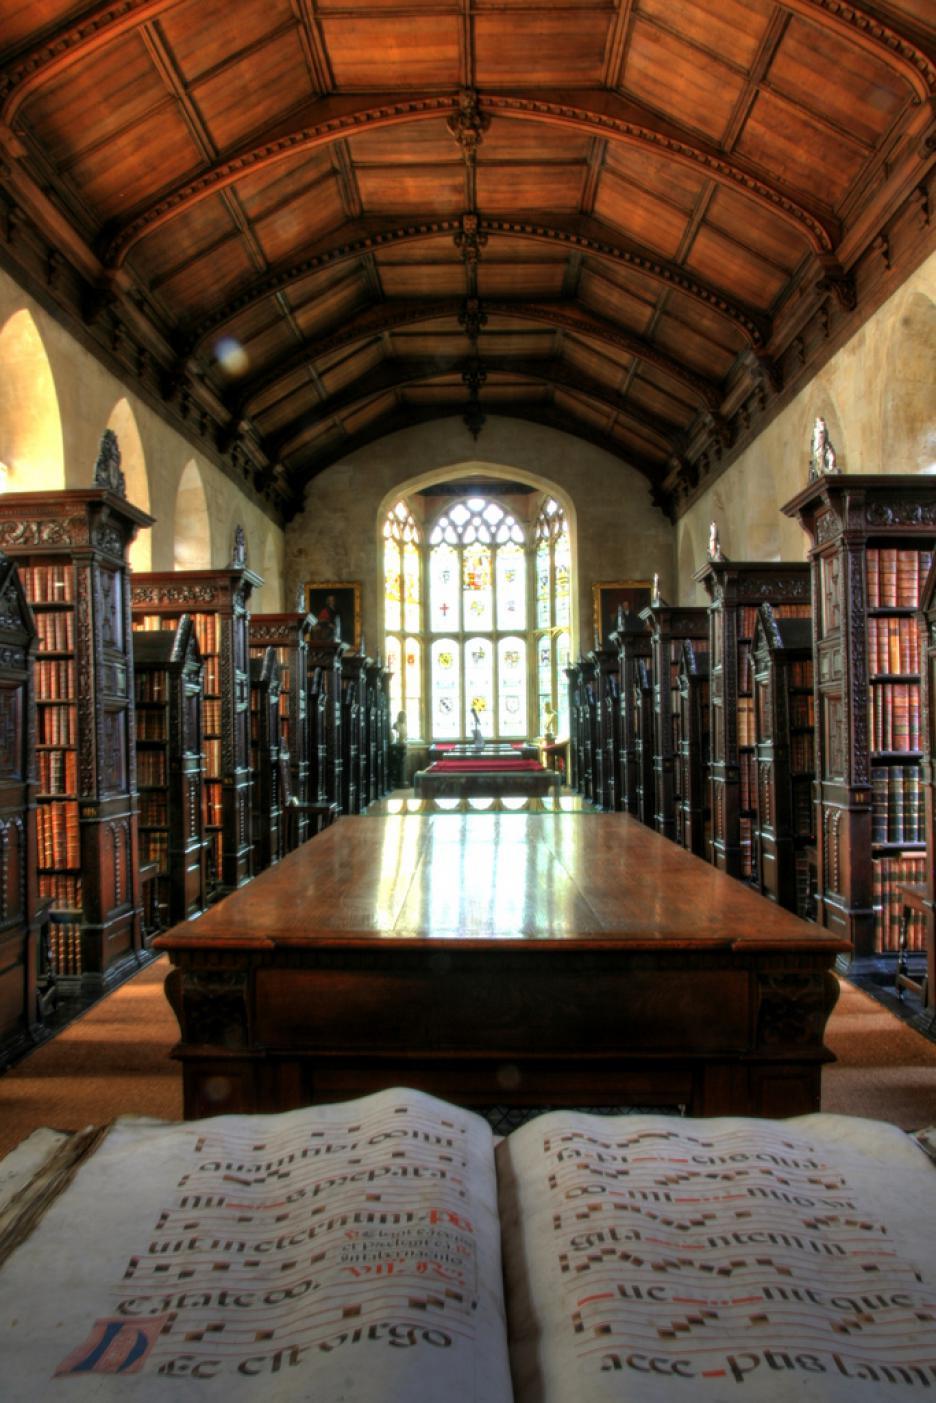 Библиотеката свети Джон, Кеймбридж, Великобритания